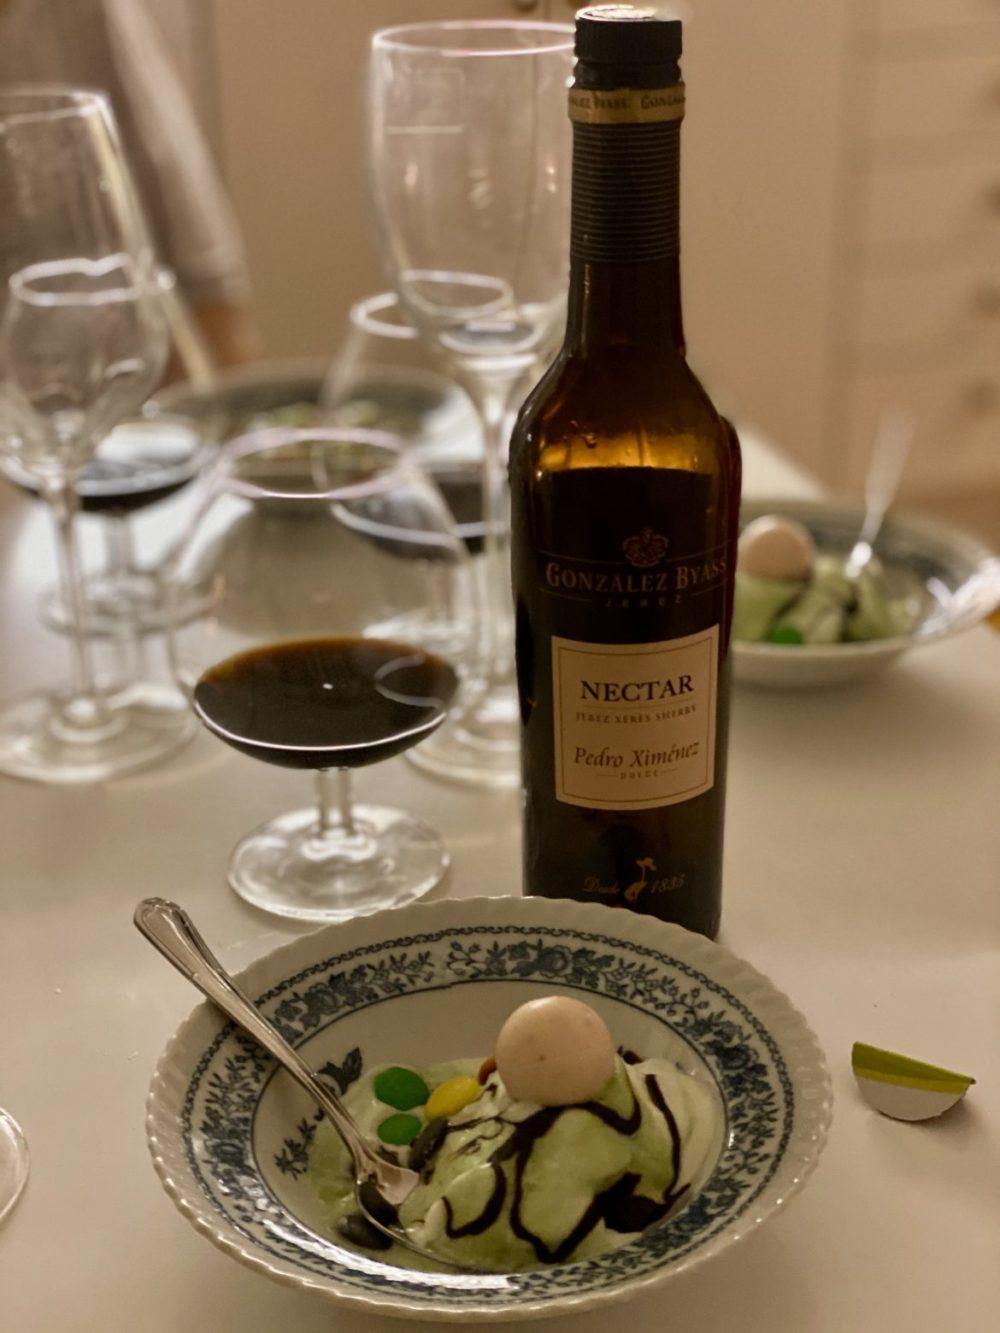 pedro Ximenez nectar sherry